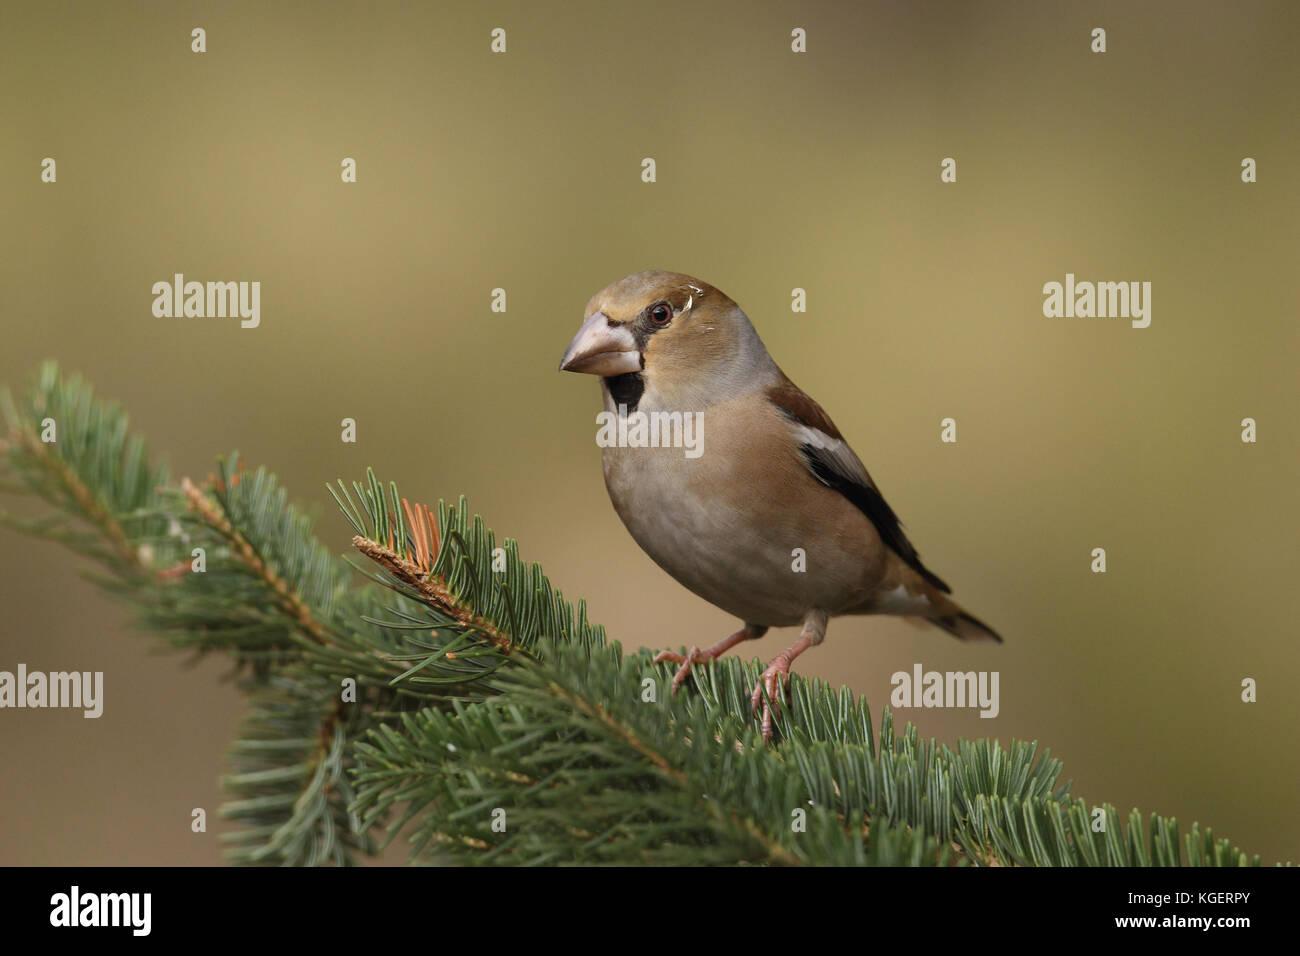 Eurasian hawfinch - Stock Image